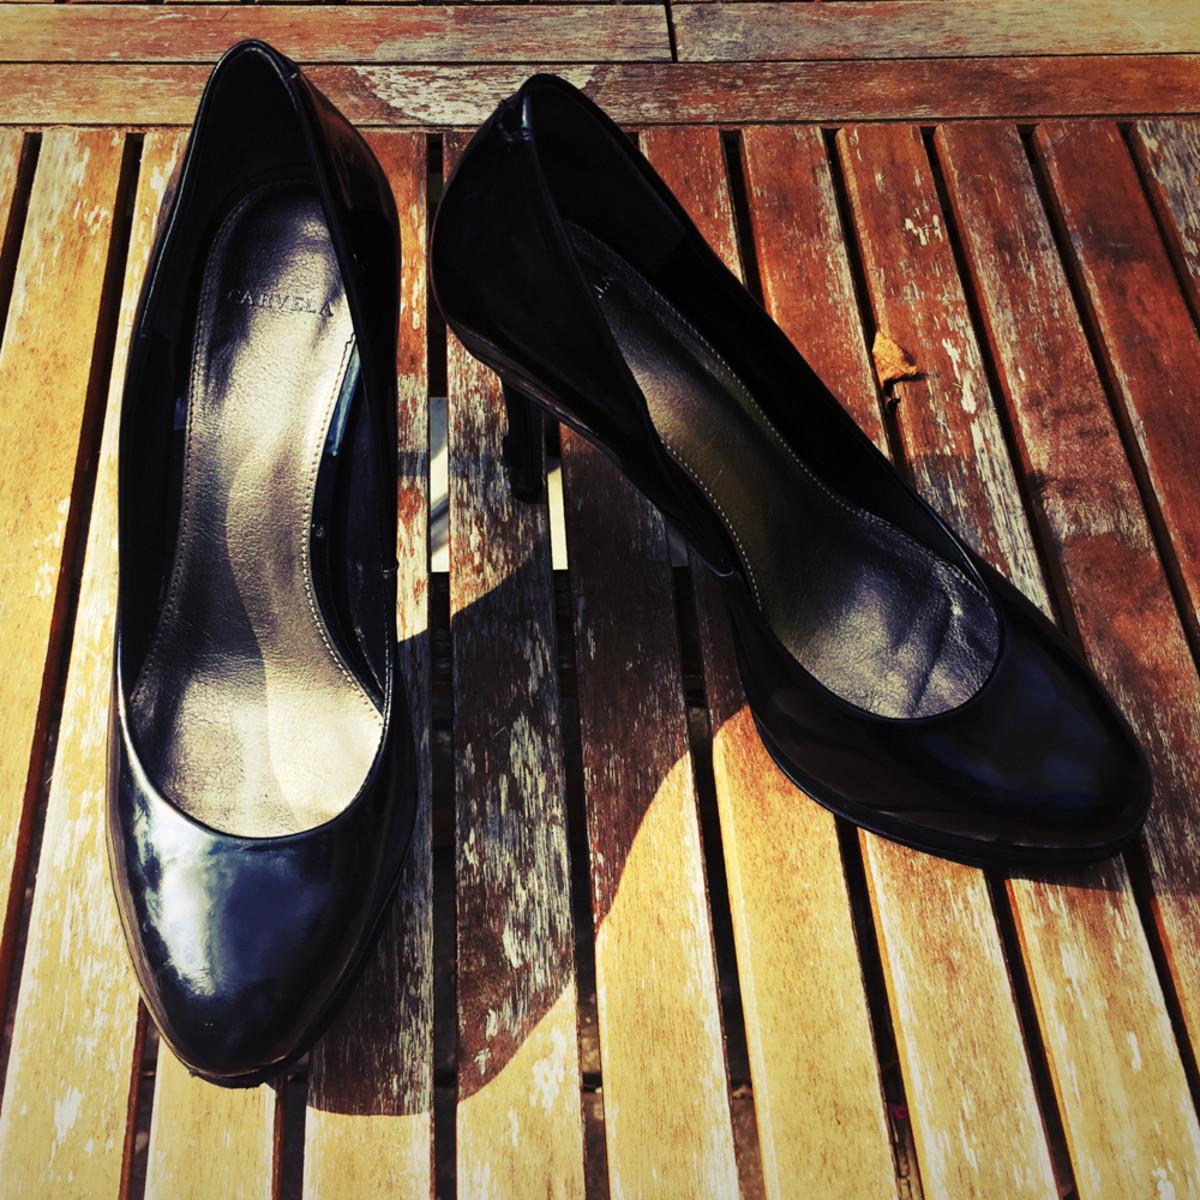 Use Vaseline to Shine Shoes